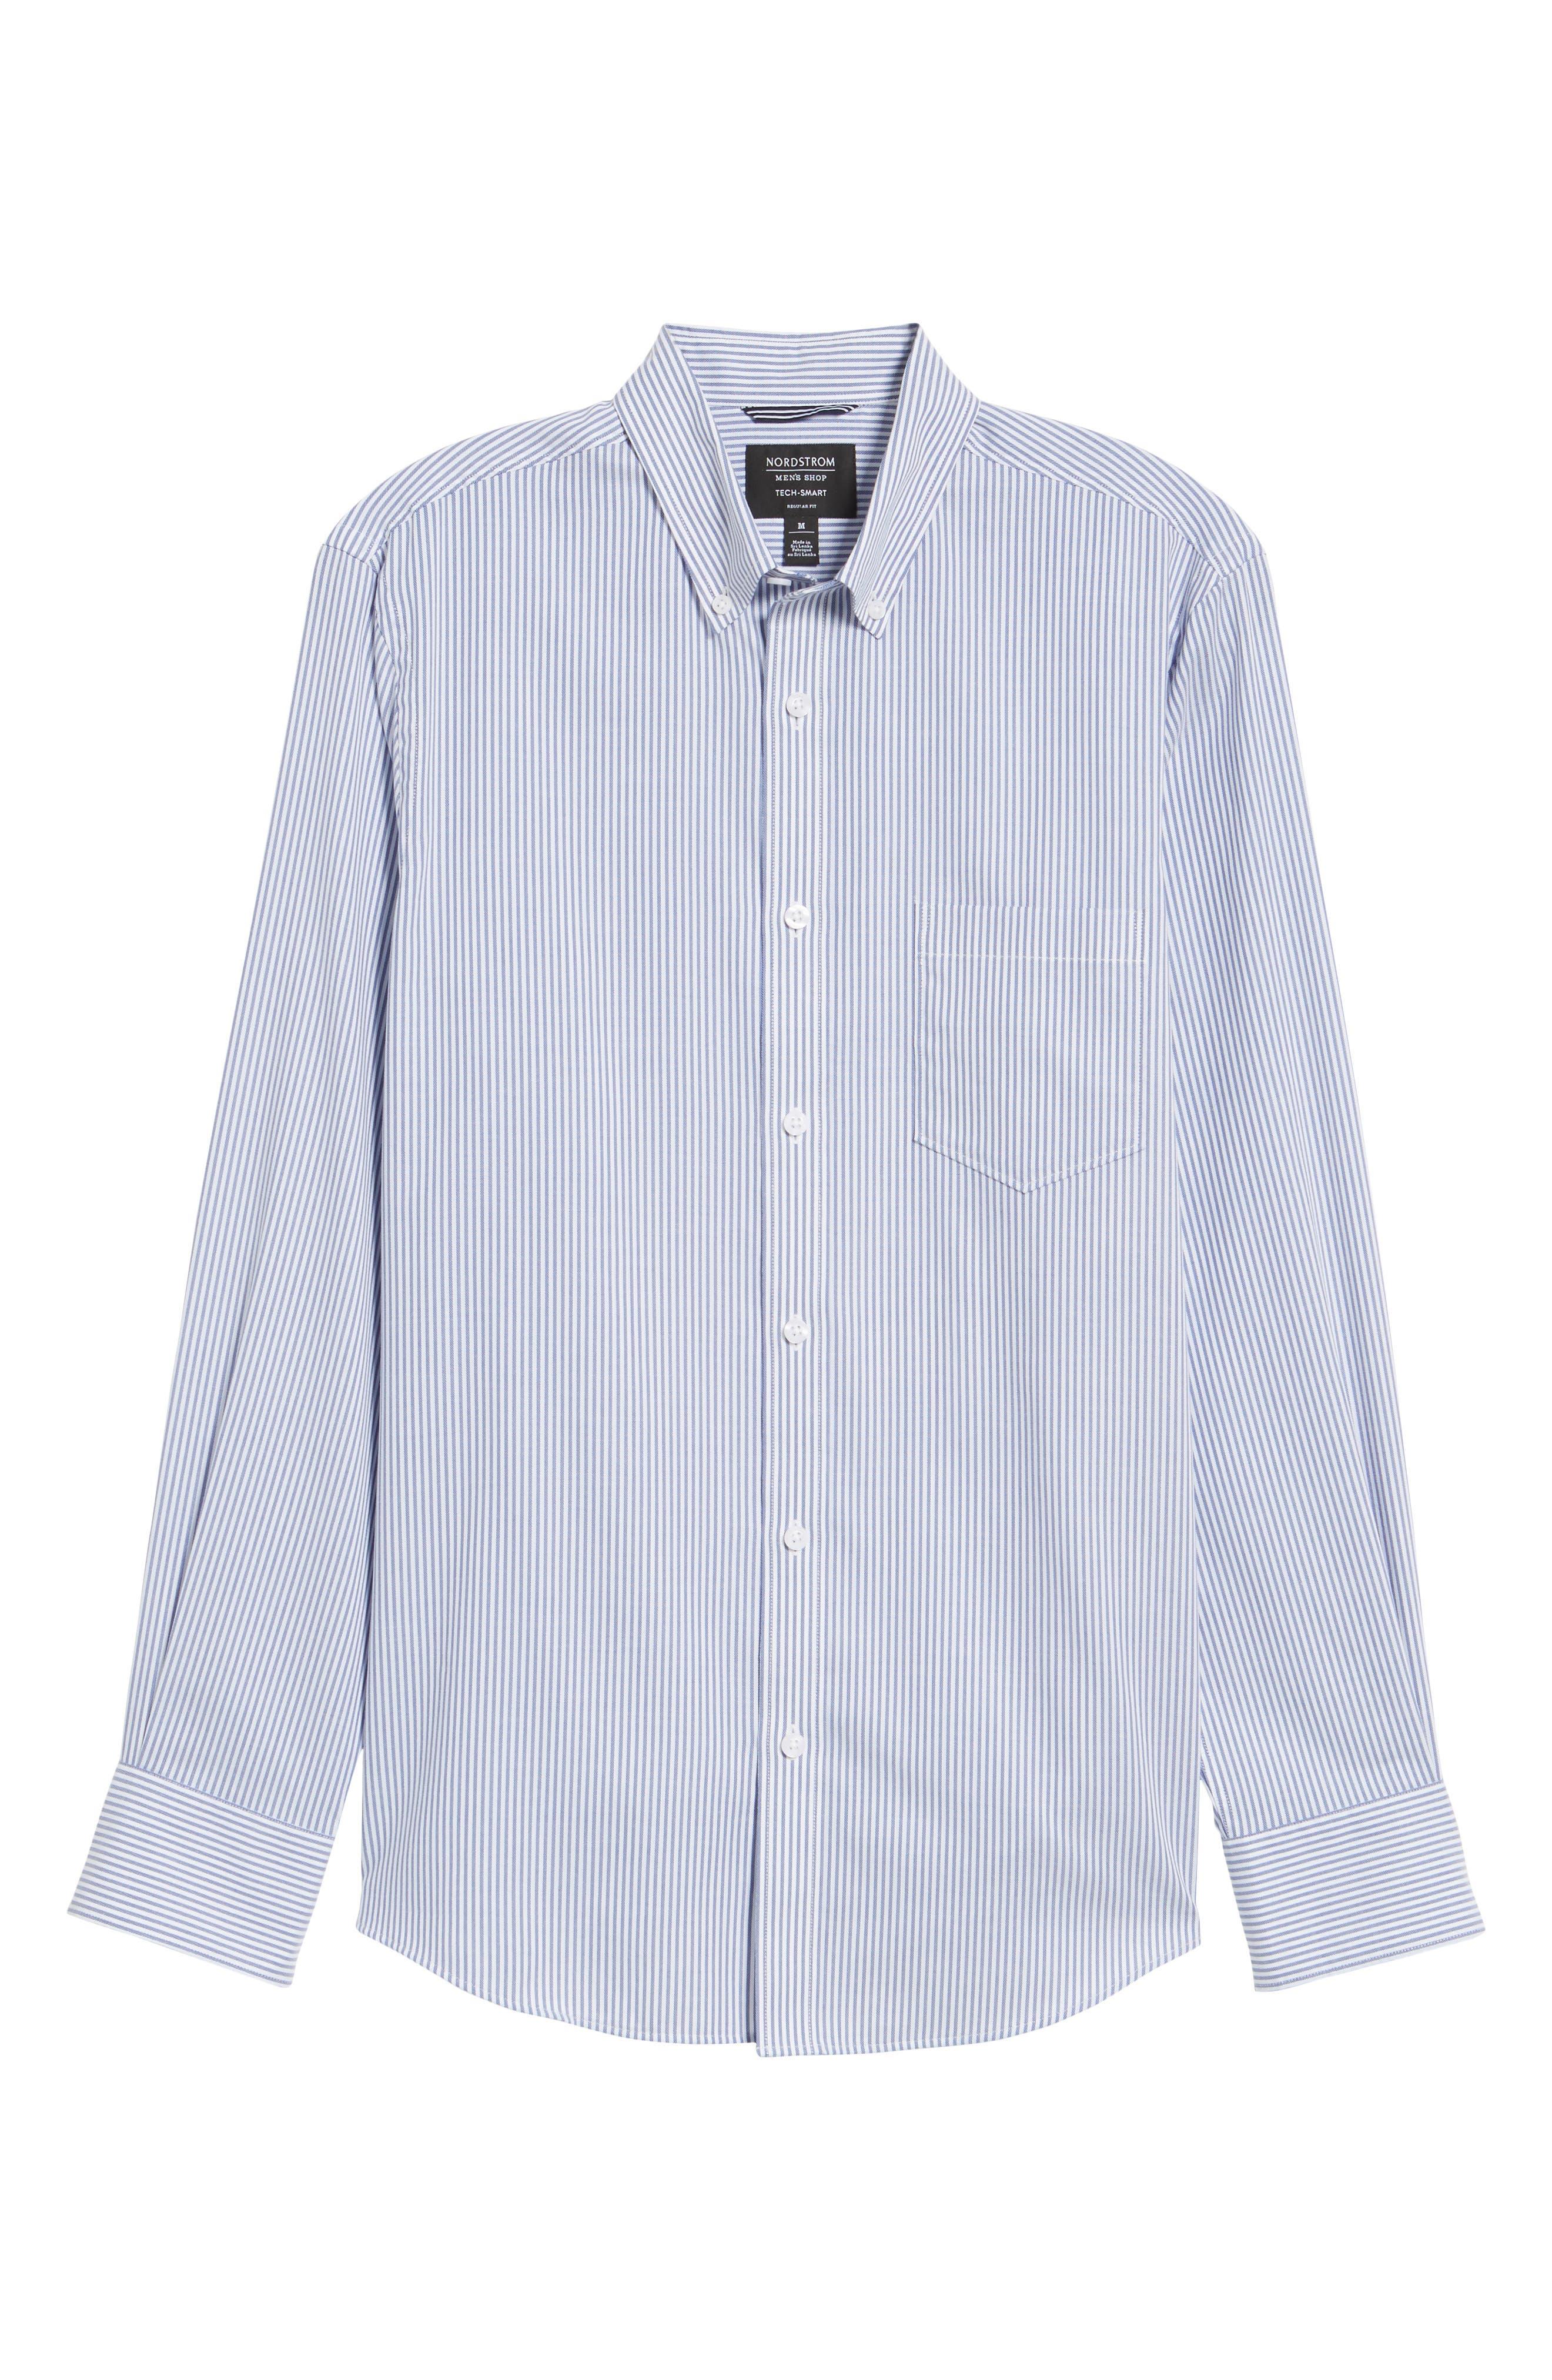 Tech-Smart Regular Fit Stripe Sport Shirt,                             Alternate thumbnail 6, color,                             Navy Iris White Stripe